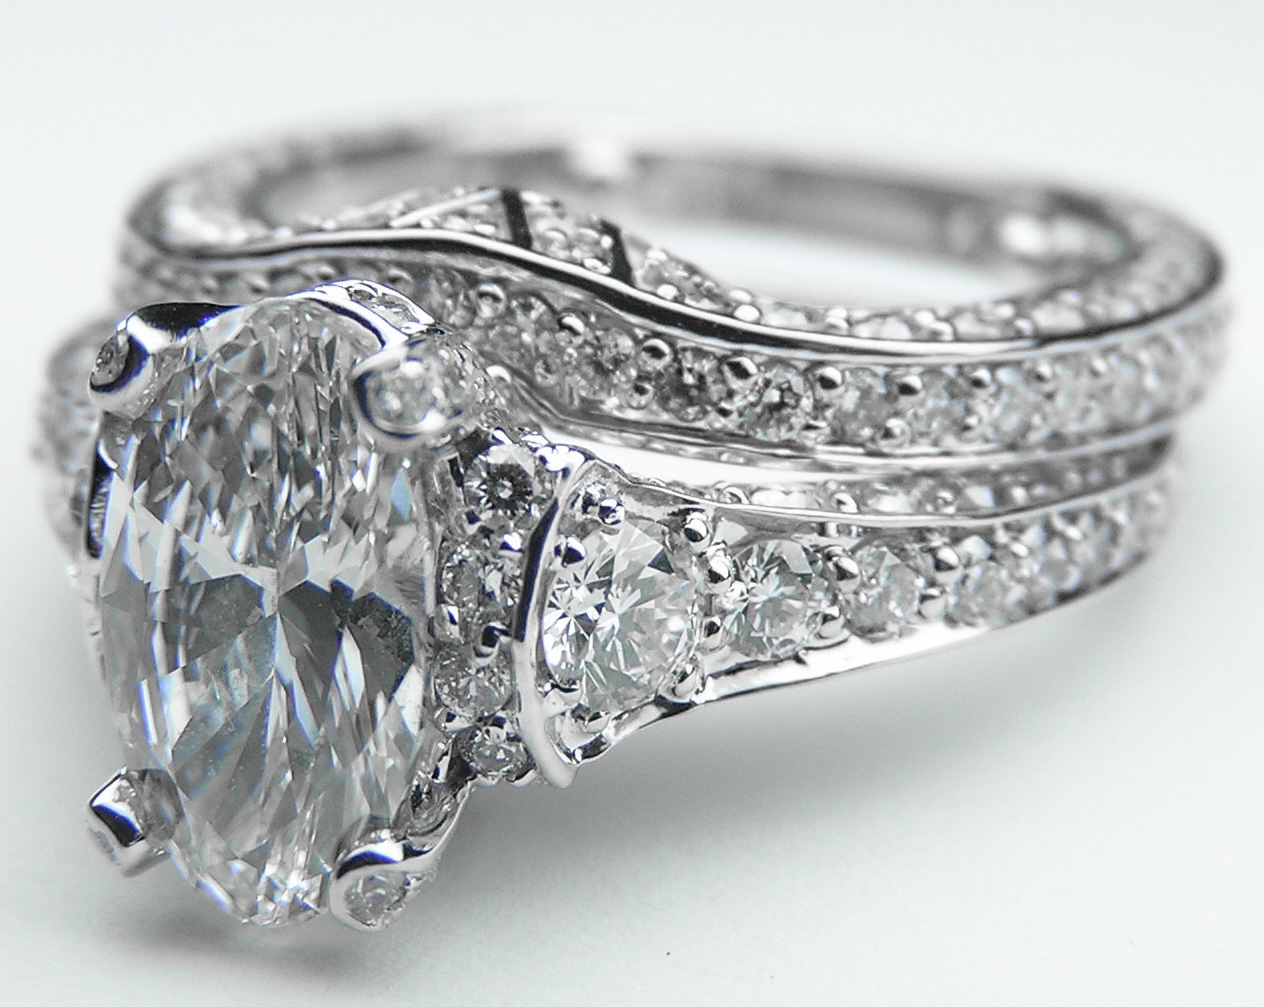 Engagement Ring -Large Oval Diamond - 387.1KB